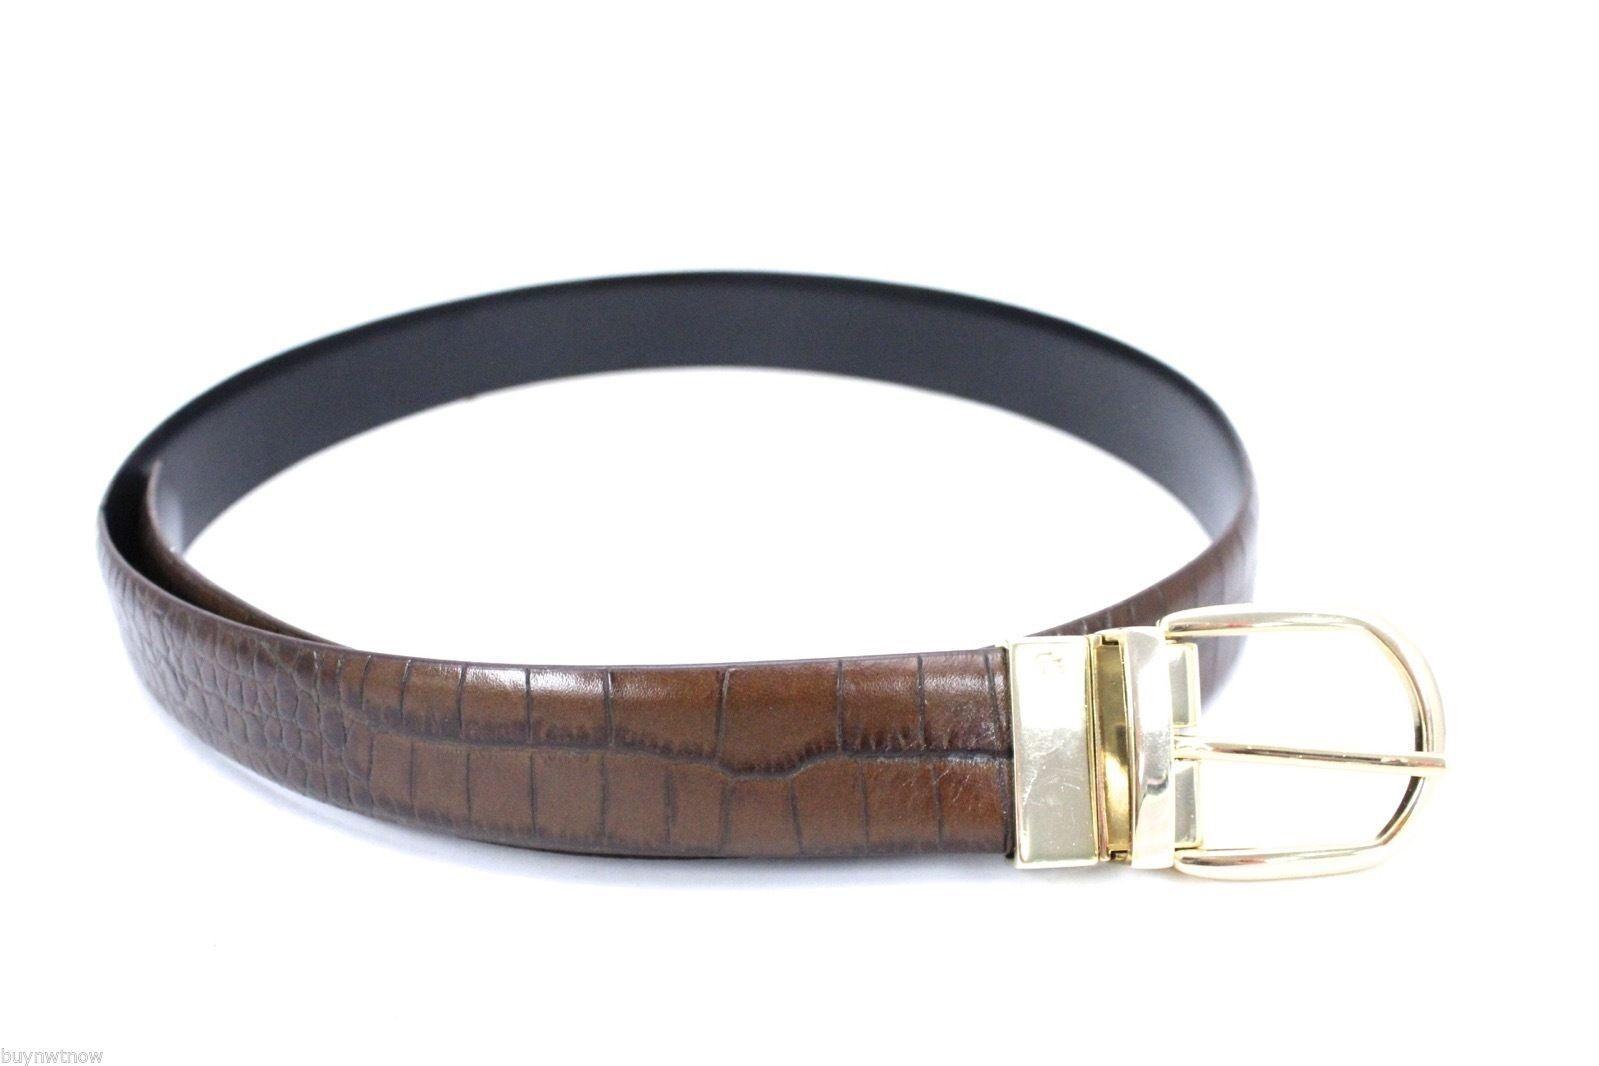 RLL Ralph Lauren Reversible Belt Brown Alligator /Black Leather Waist 33-37